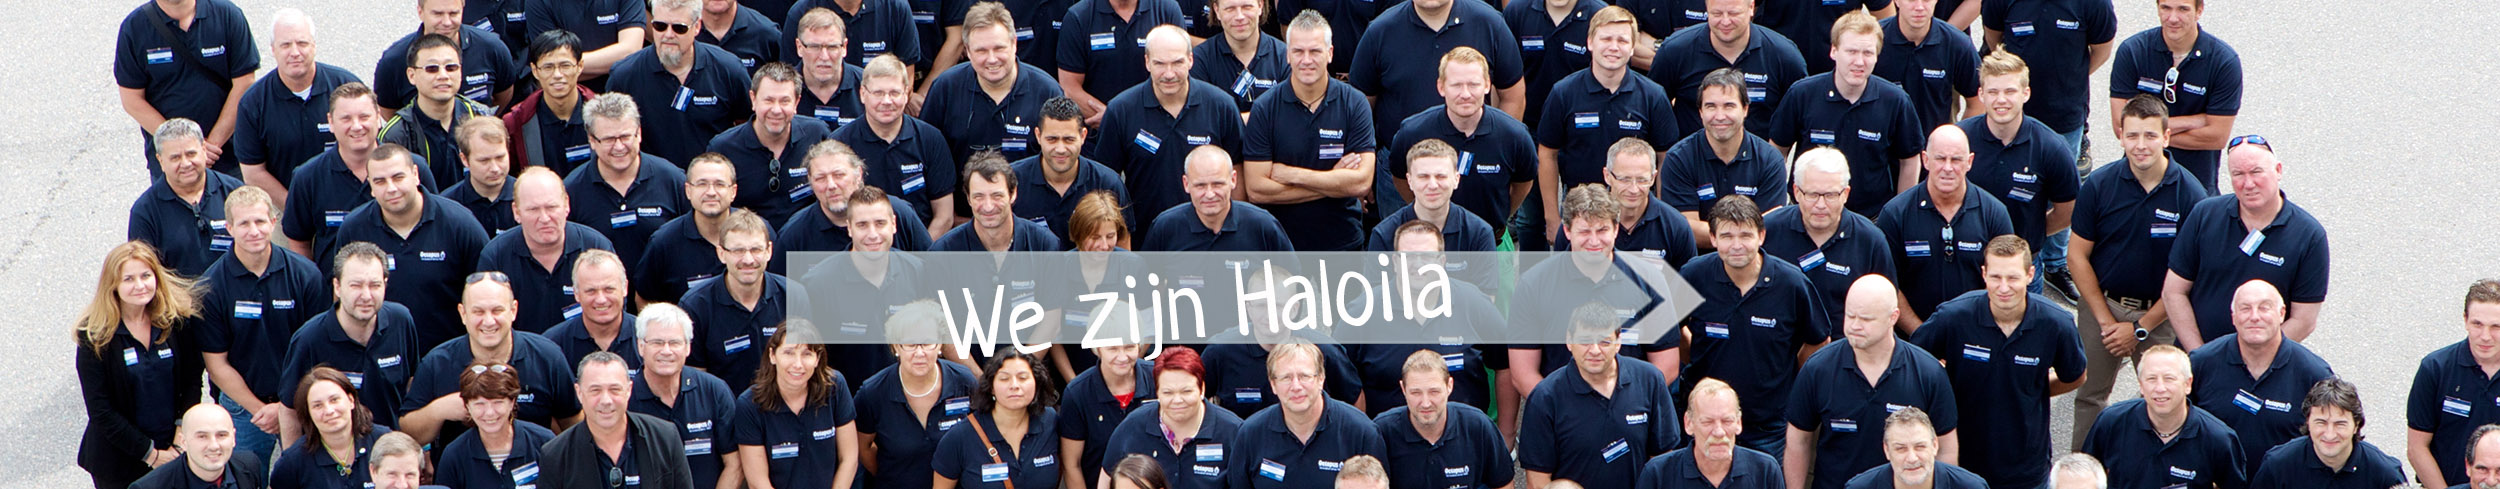 Haloila people